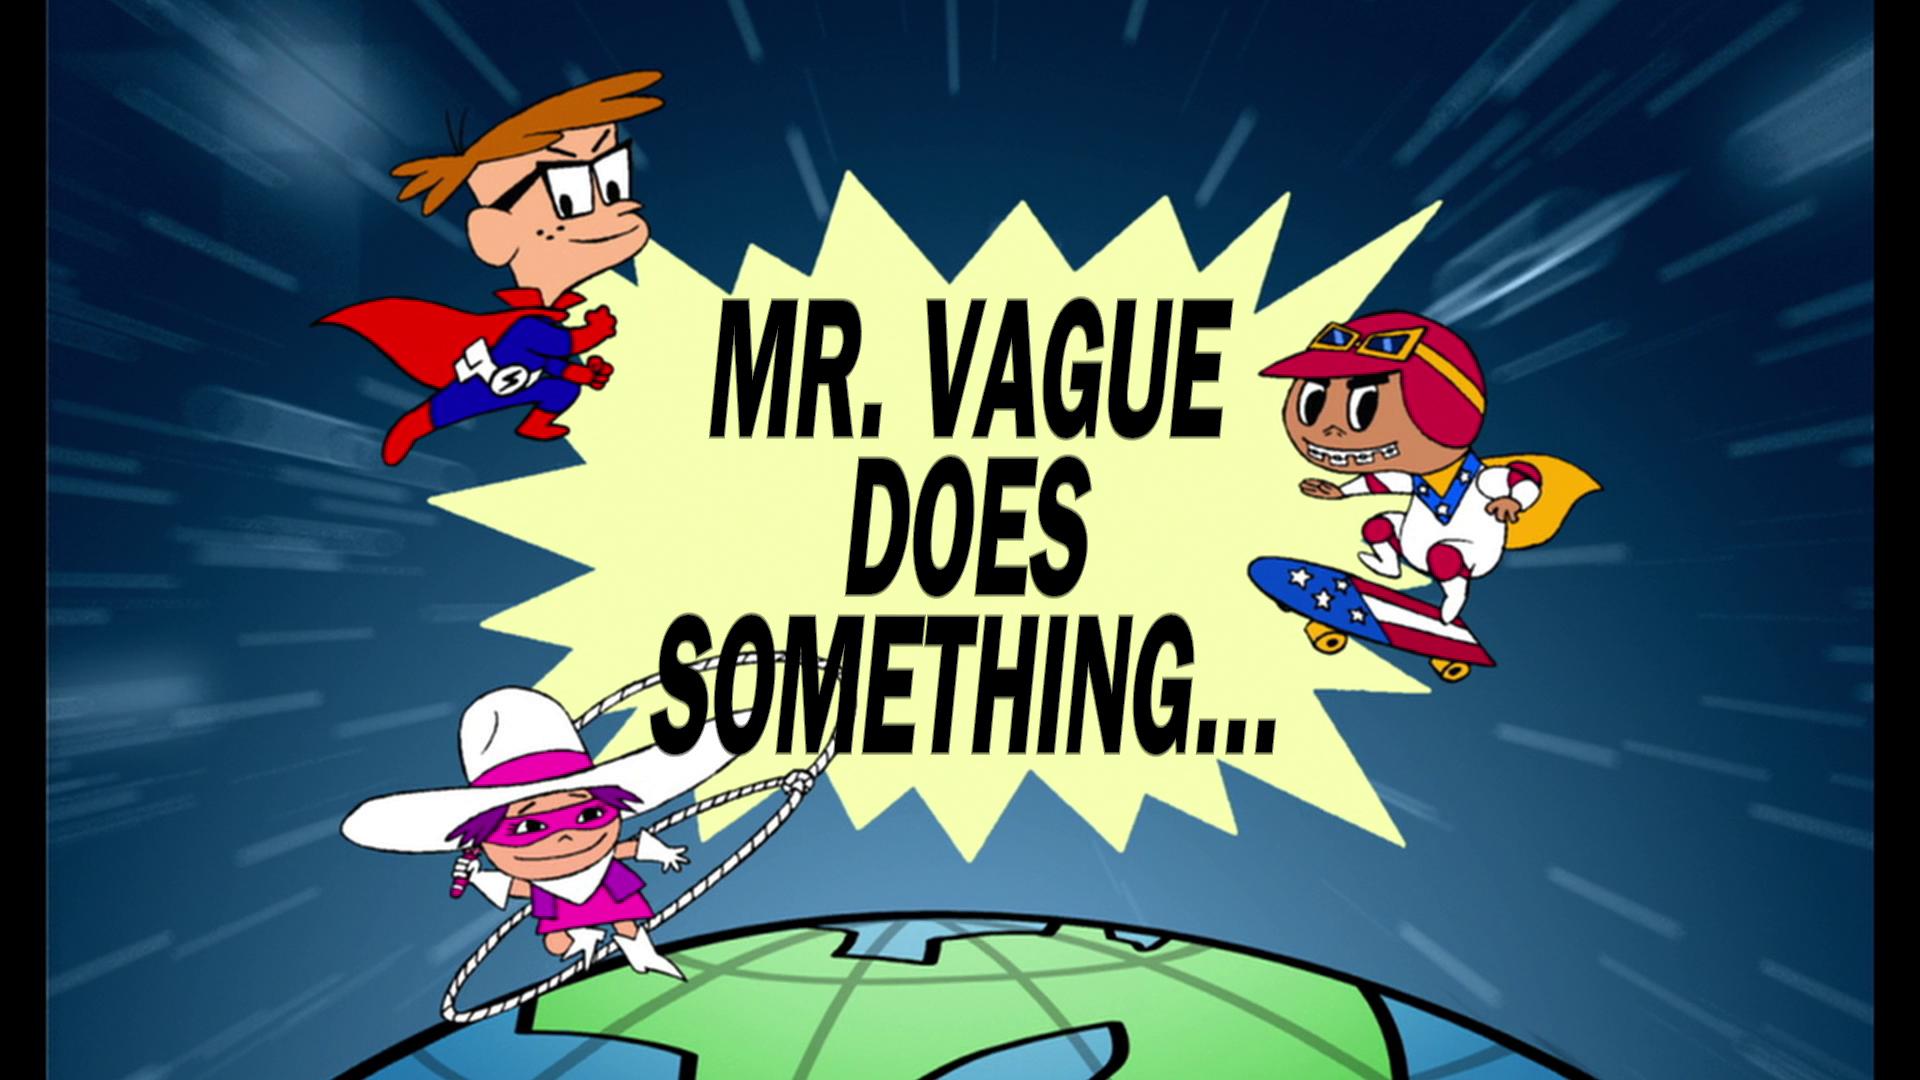 Mr. Vague Does Something...